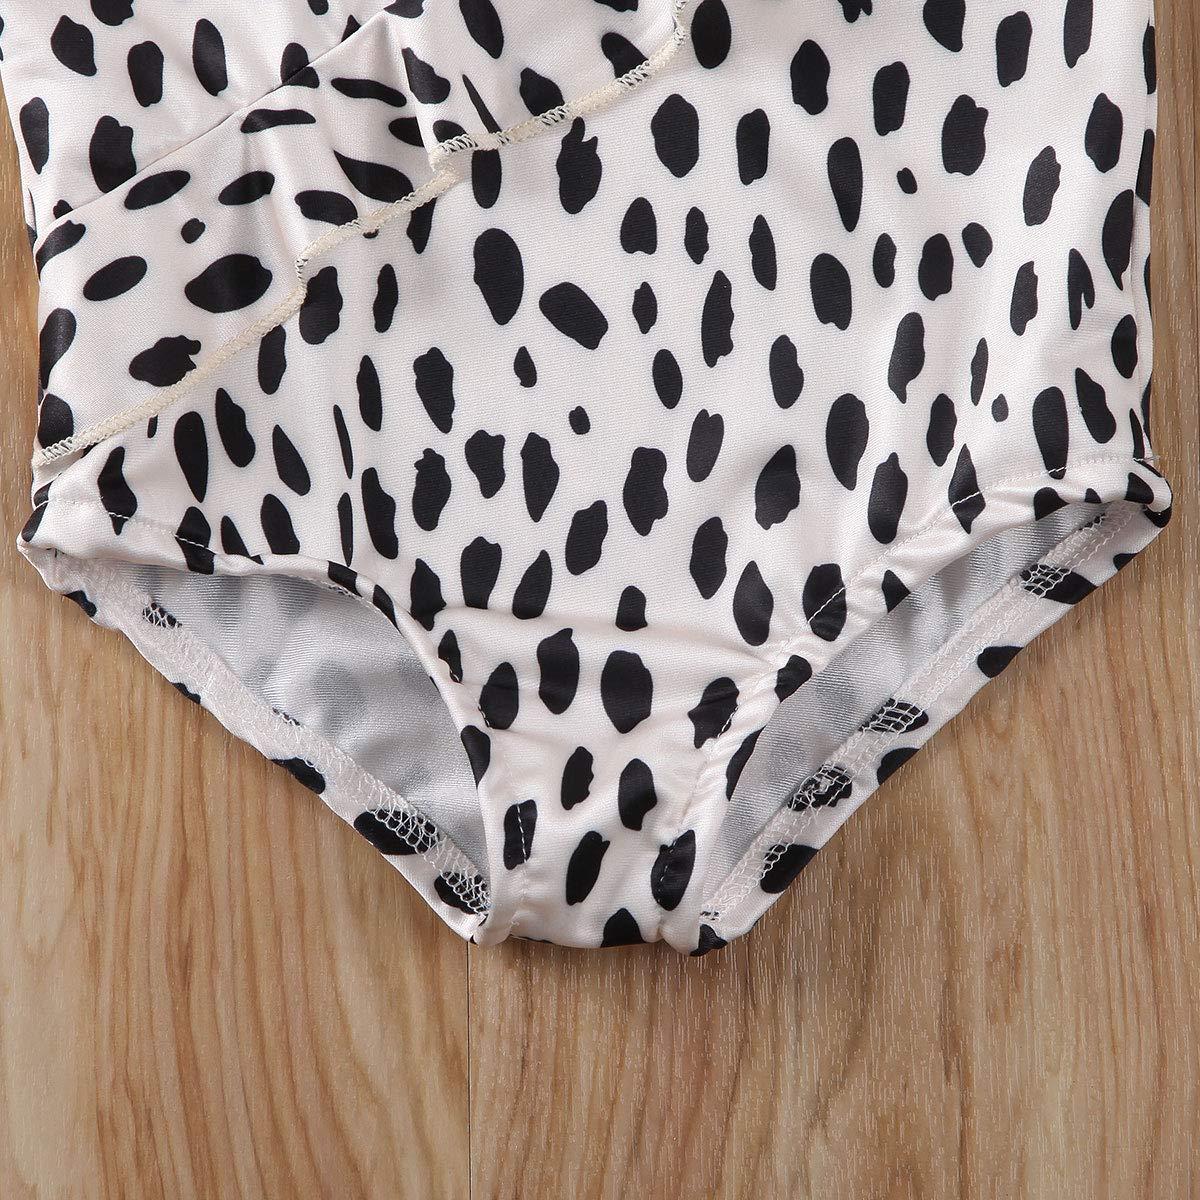 Seyurigaoka 1-6Y Toddler Kids Baby Girl Leopard Swimsuit Strap Sleeveless Ruffle Tankini Bikini Swimwear Bathing Suits